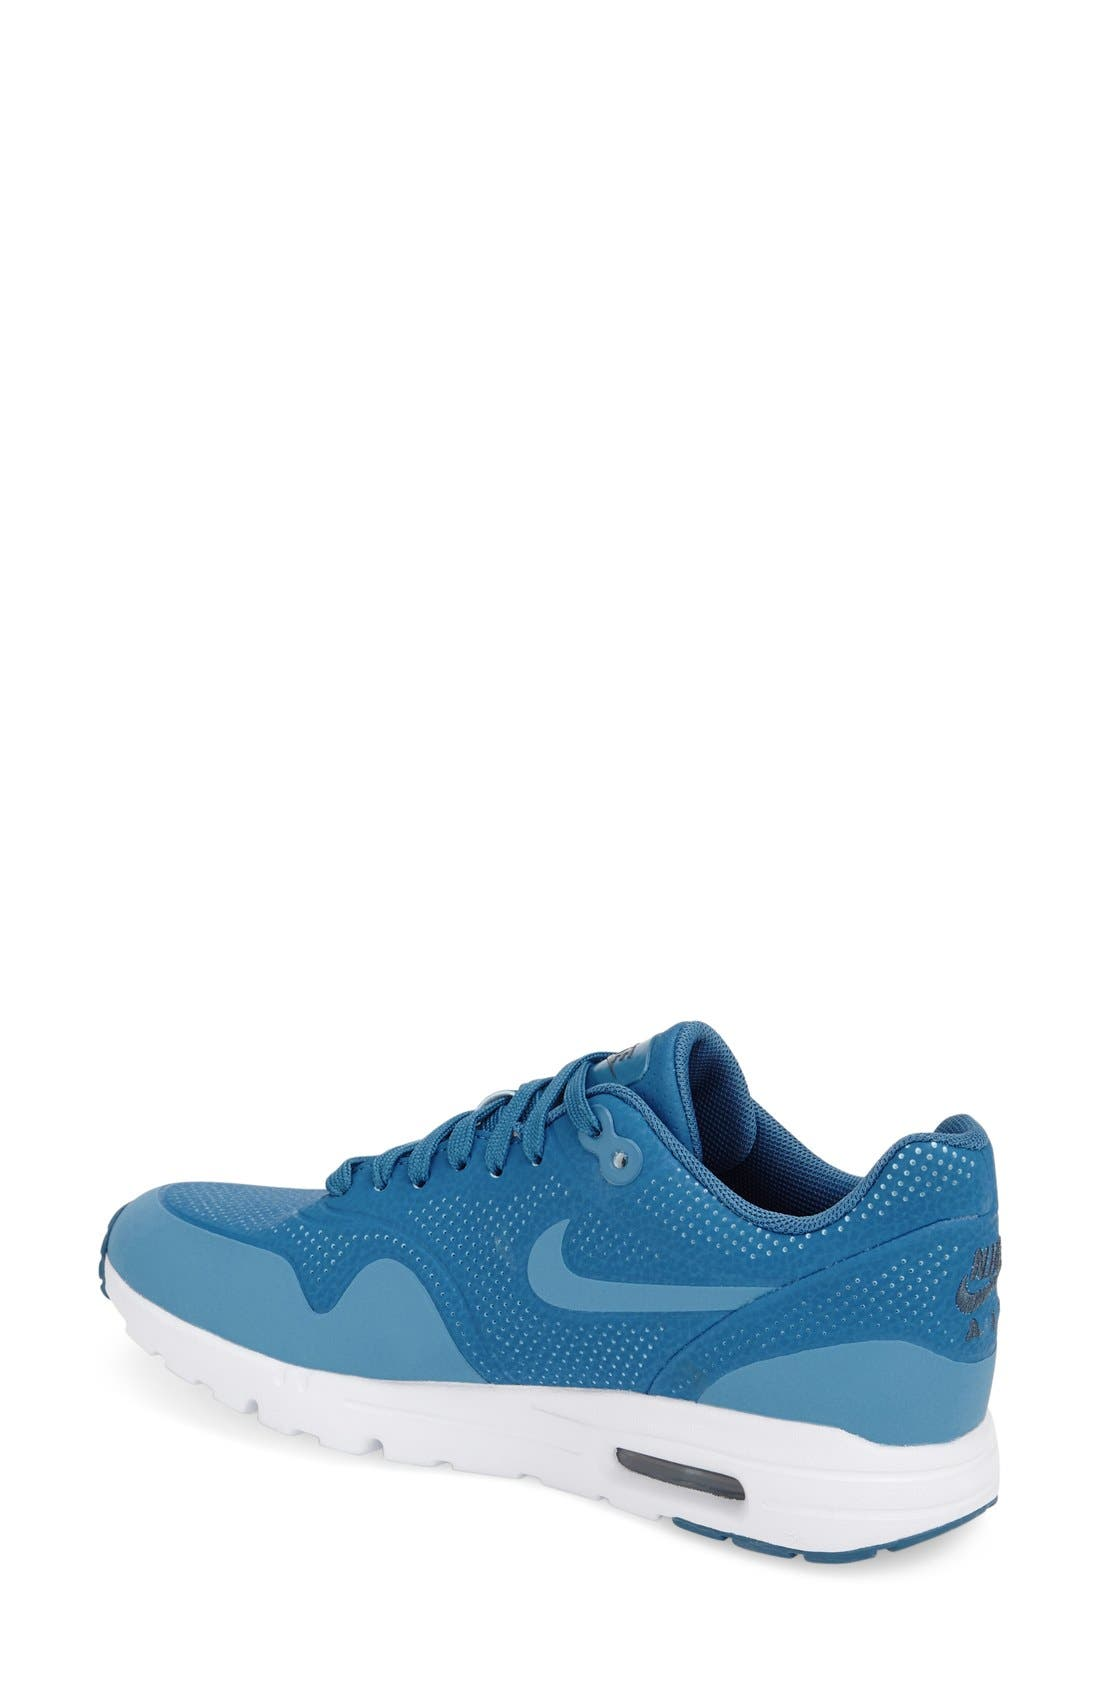 ,                             'Air Max 1 - Ultra Moire' Sneaker,                             Alternate thumbnail 80, color,                             402